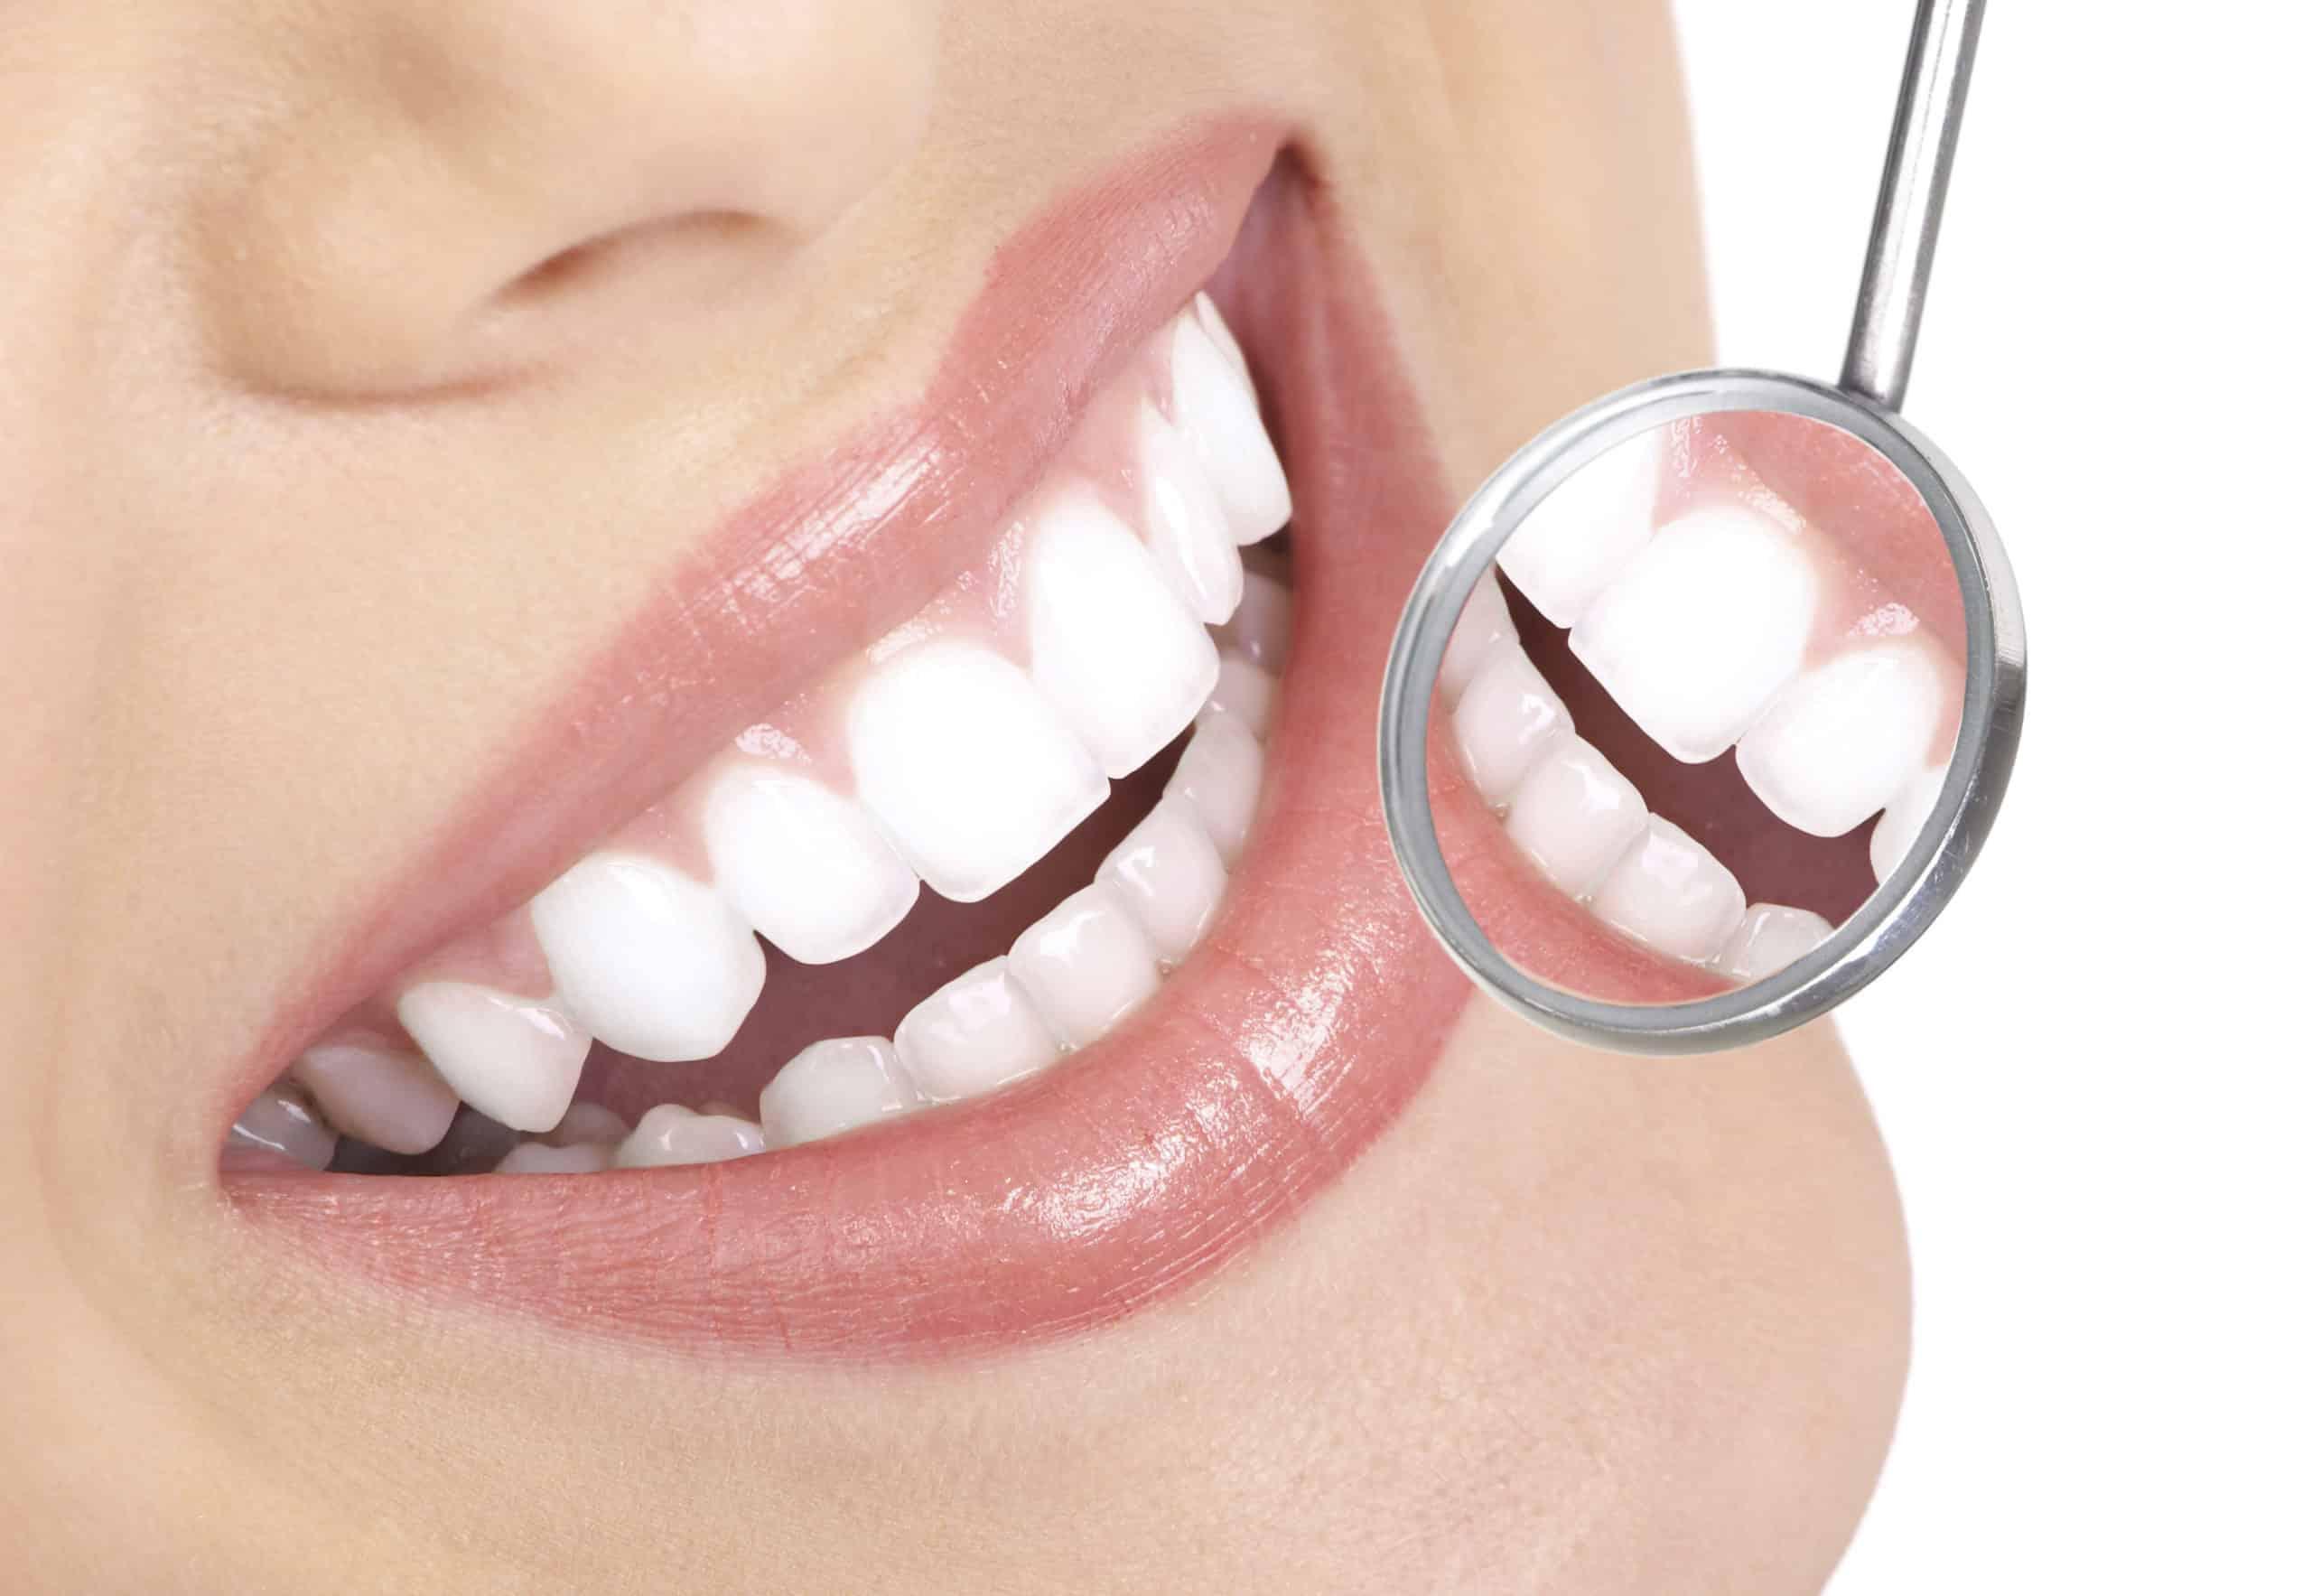 General dentistry in Chicago, Evanston, & Skokie